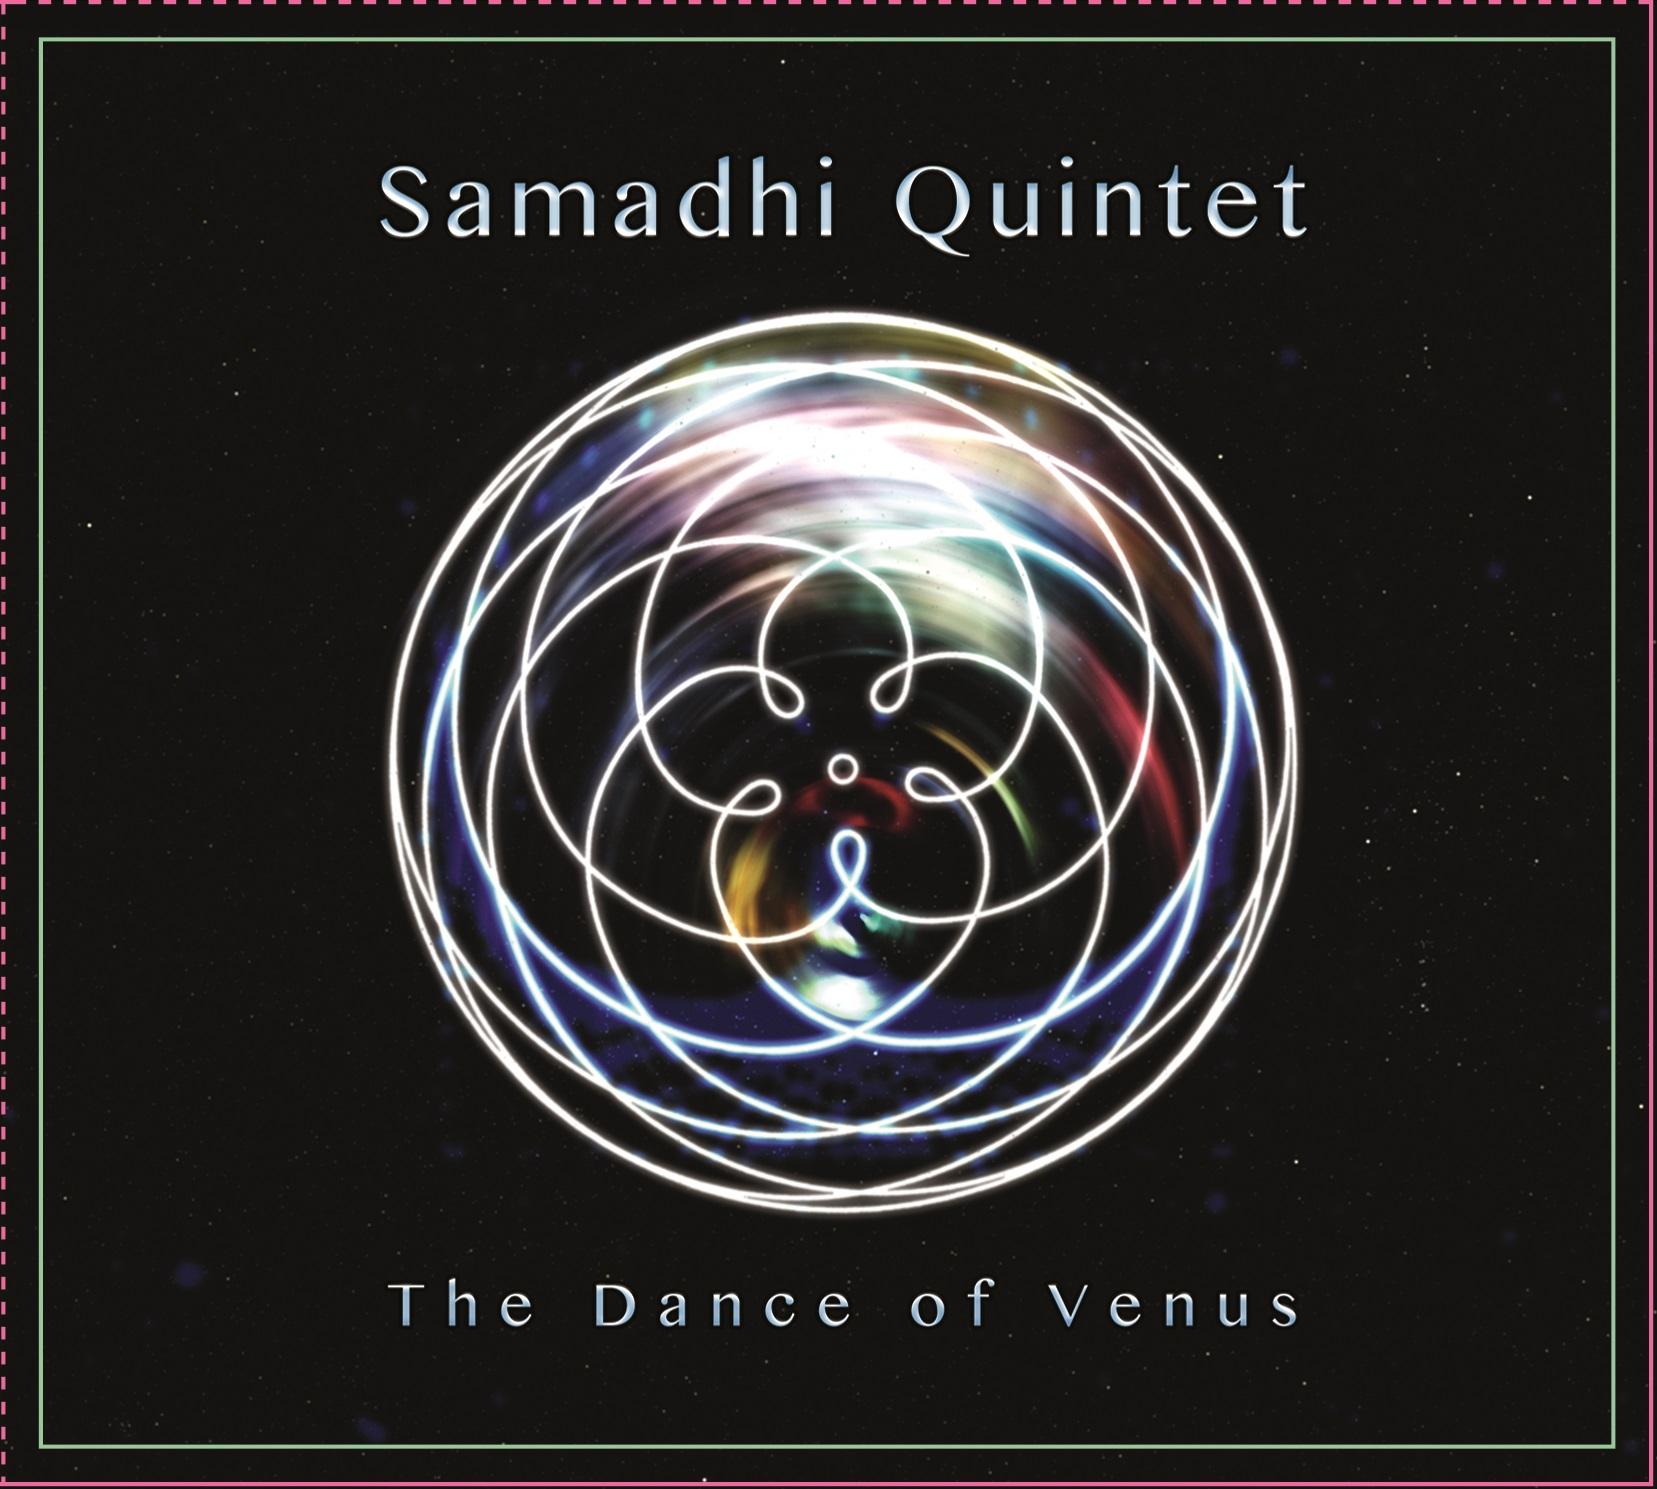 The Dance of Venus